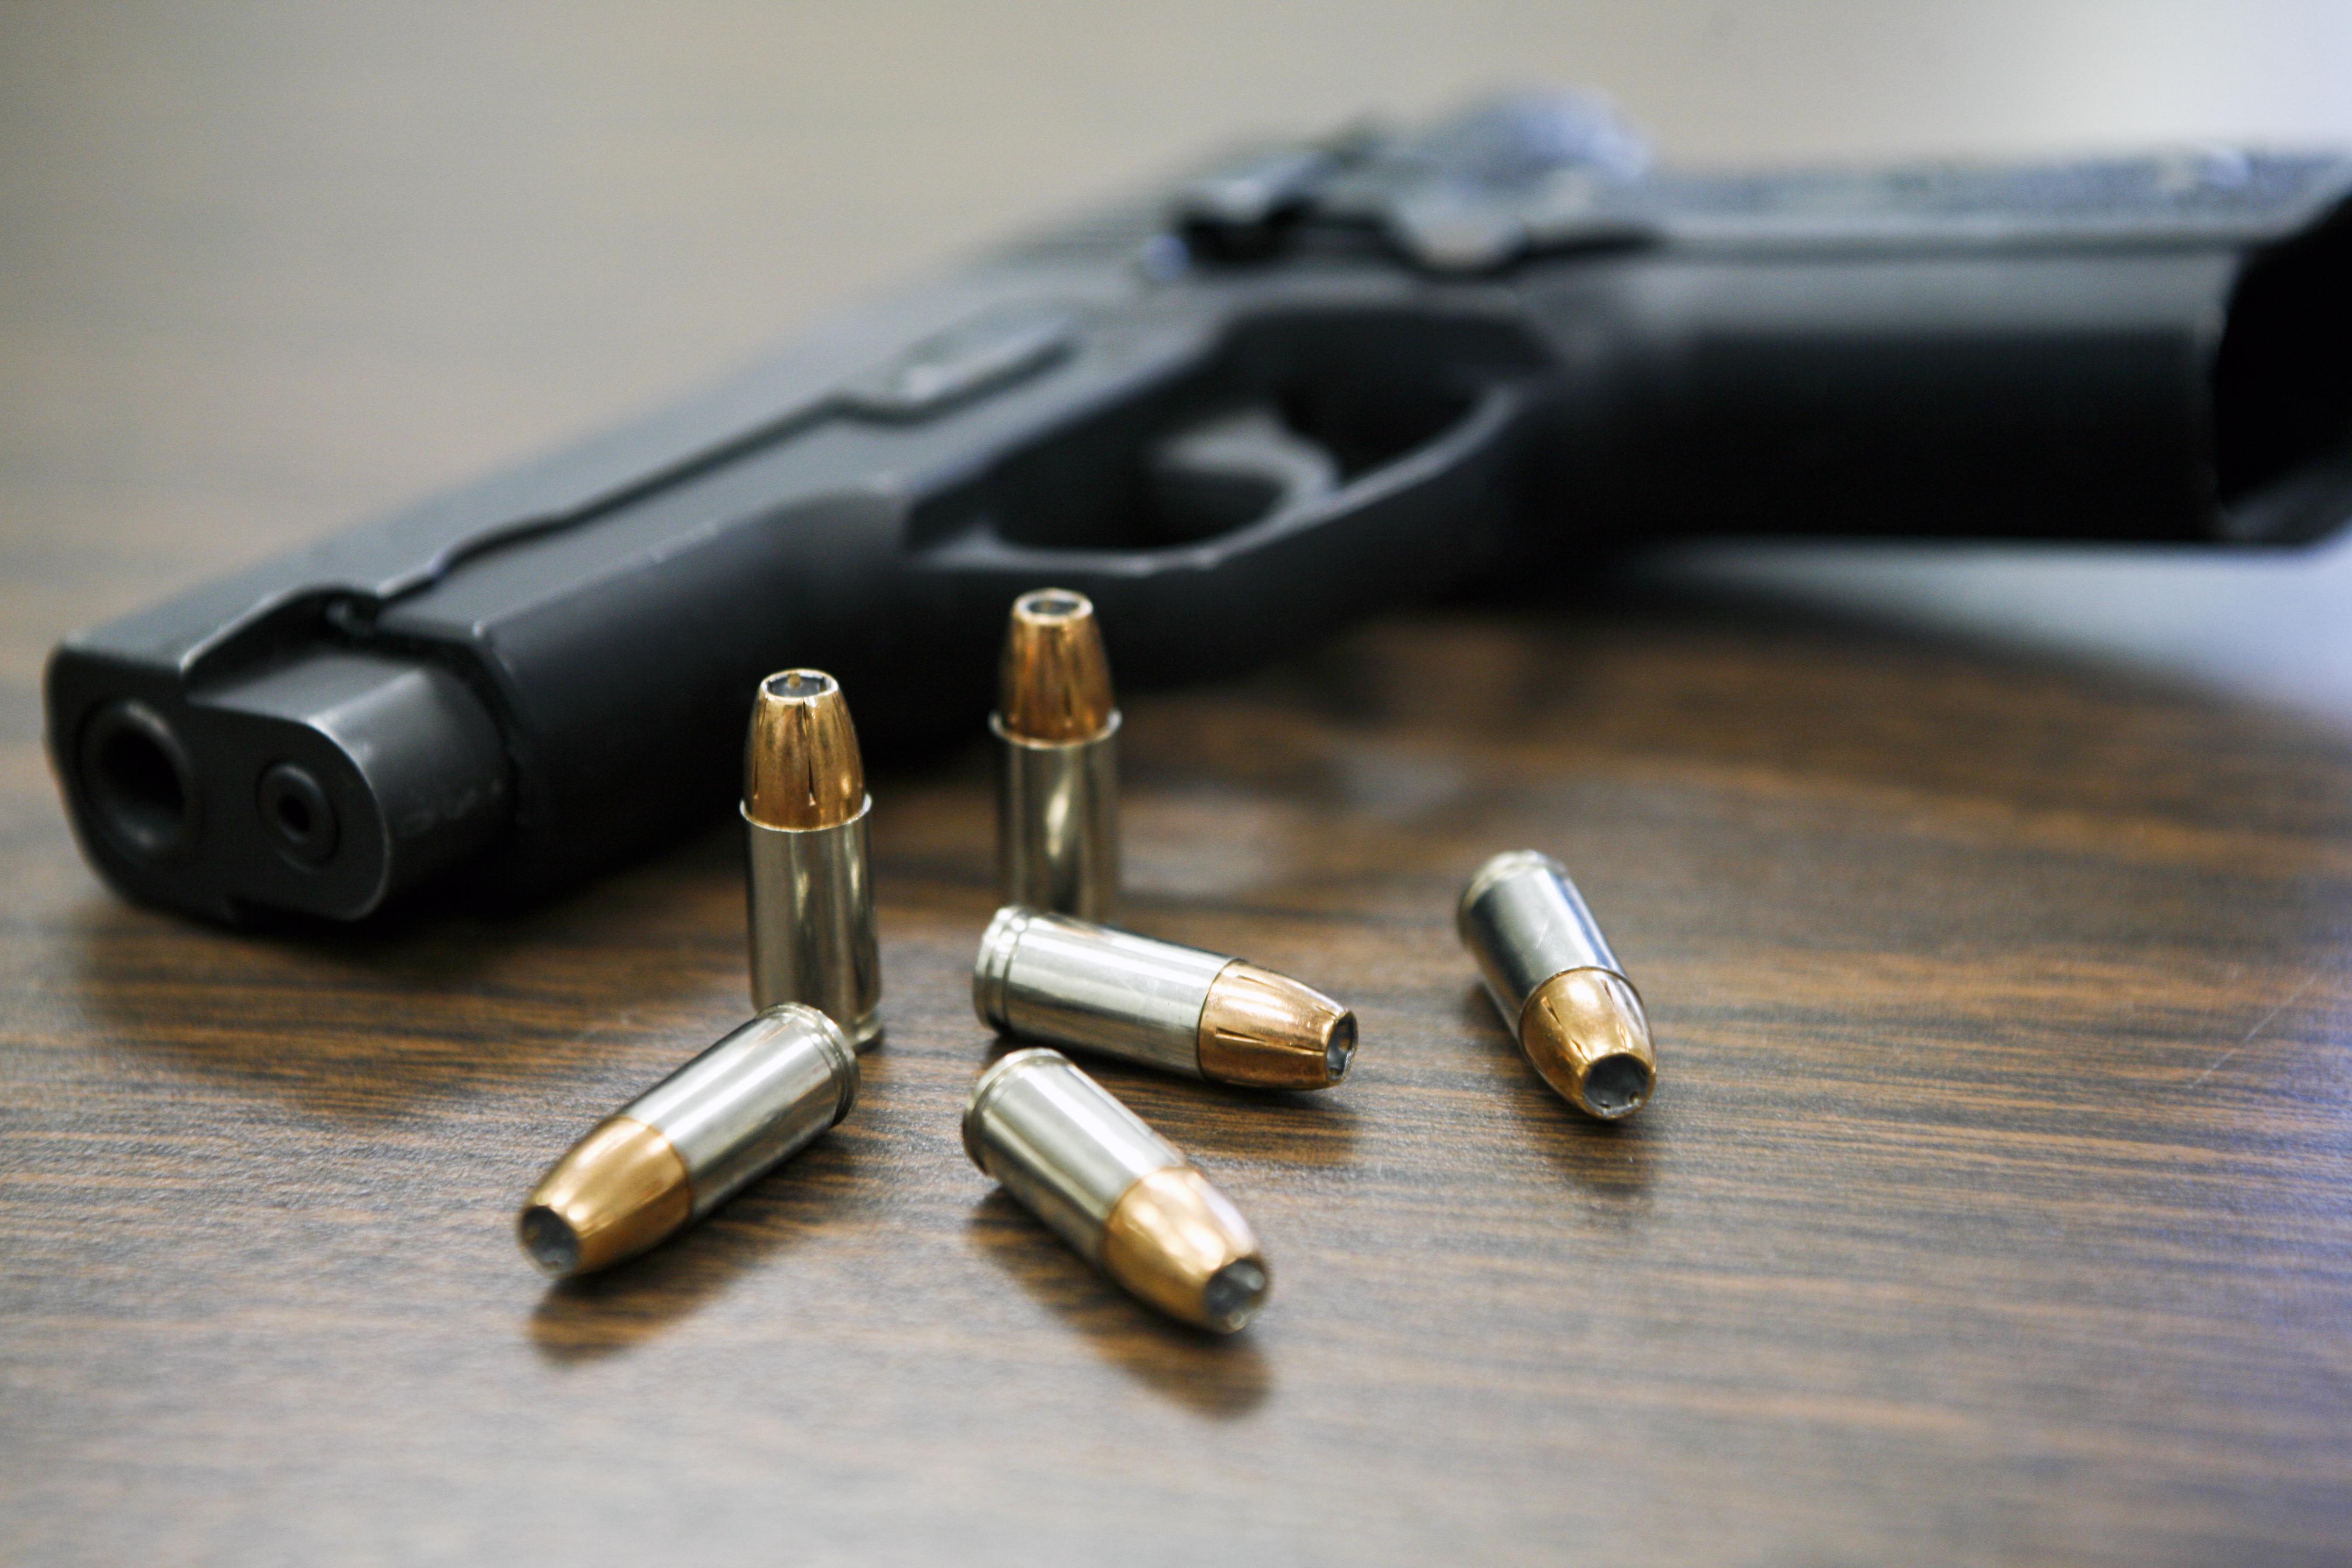 File:Gun violence.jpg - Wikimedia Commons